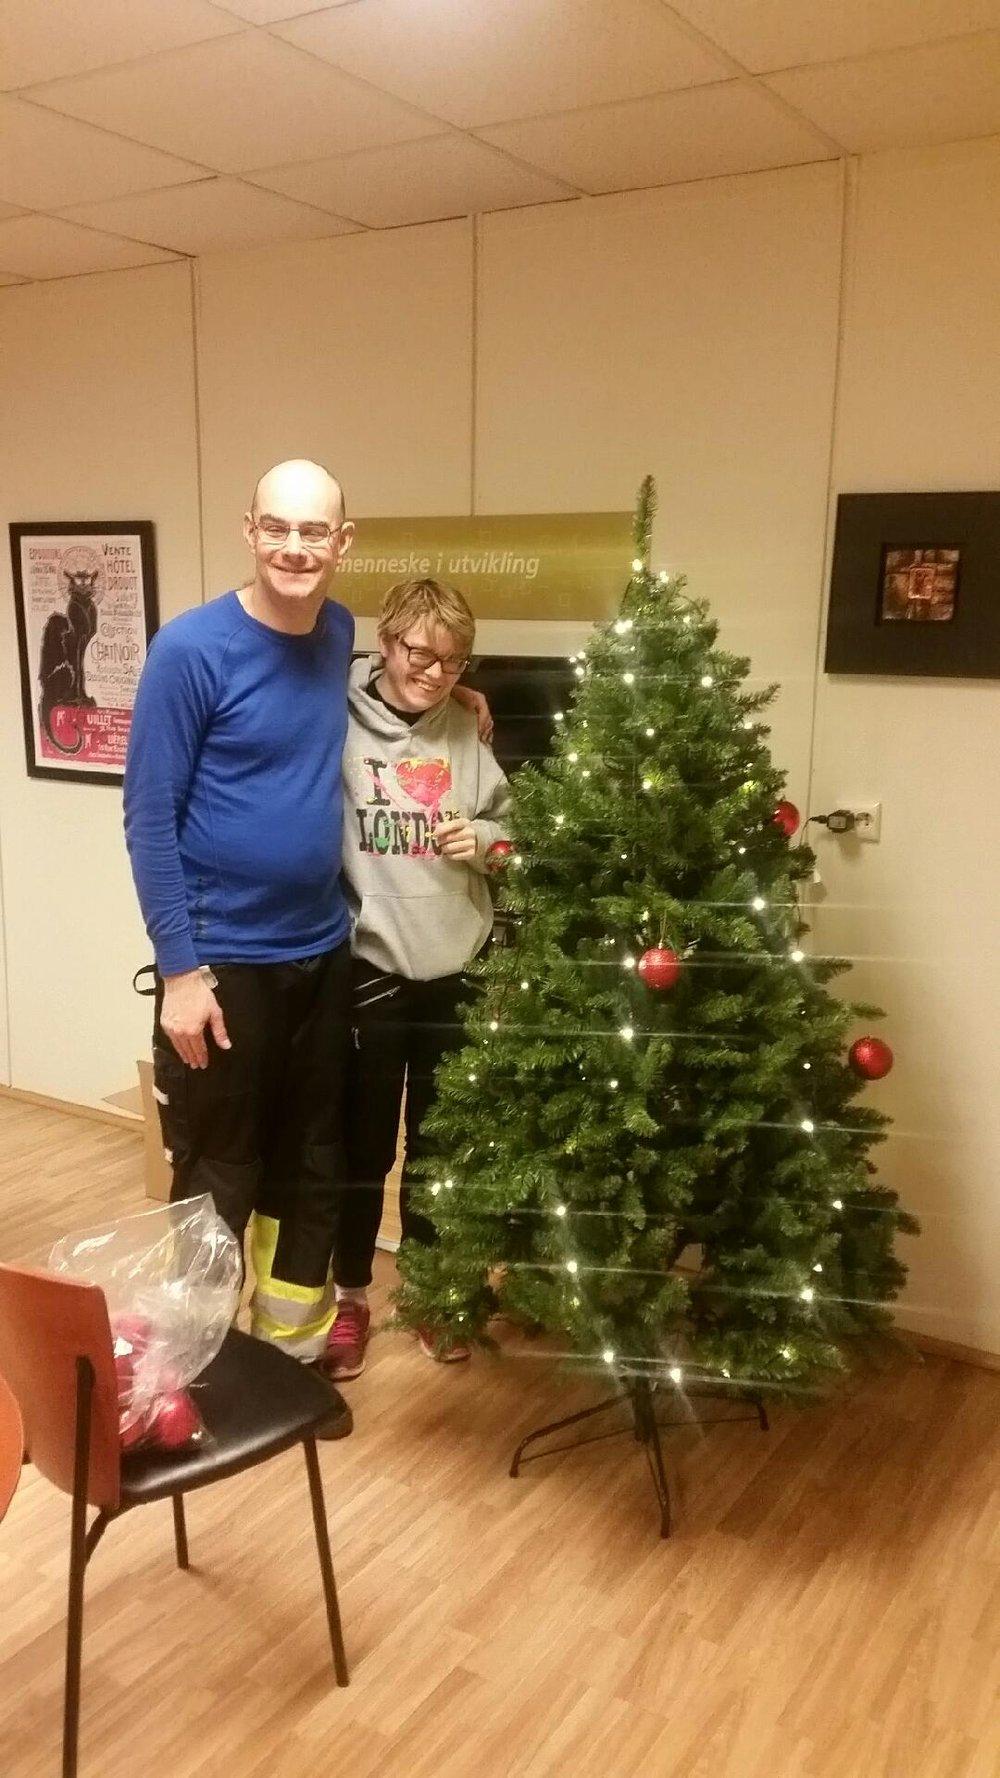 16)Bilde Batur og Ingelin pynte juletre.jpeg